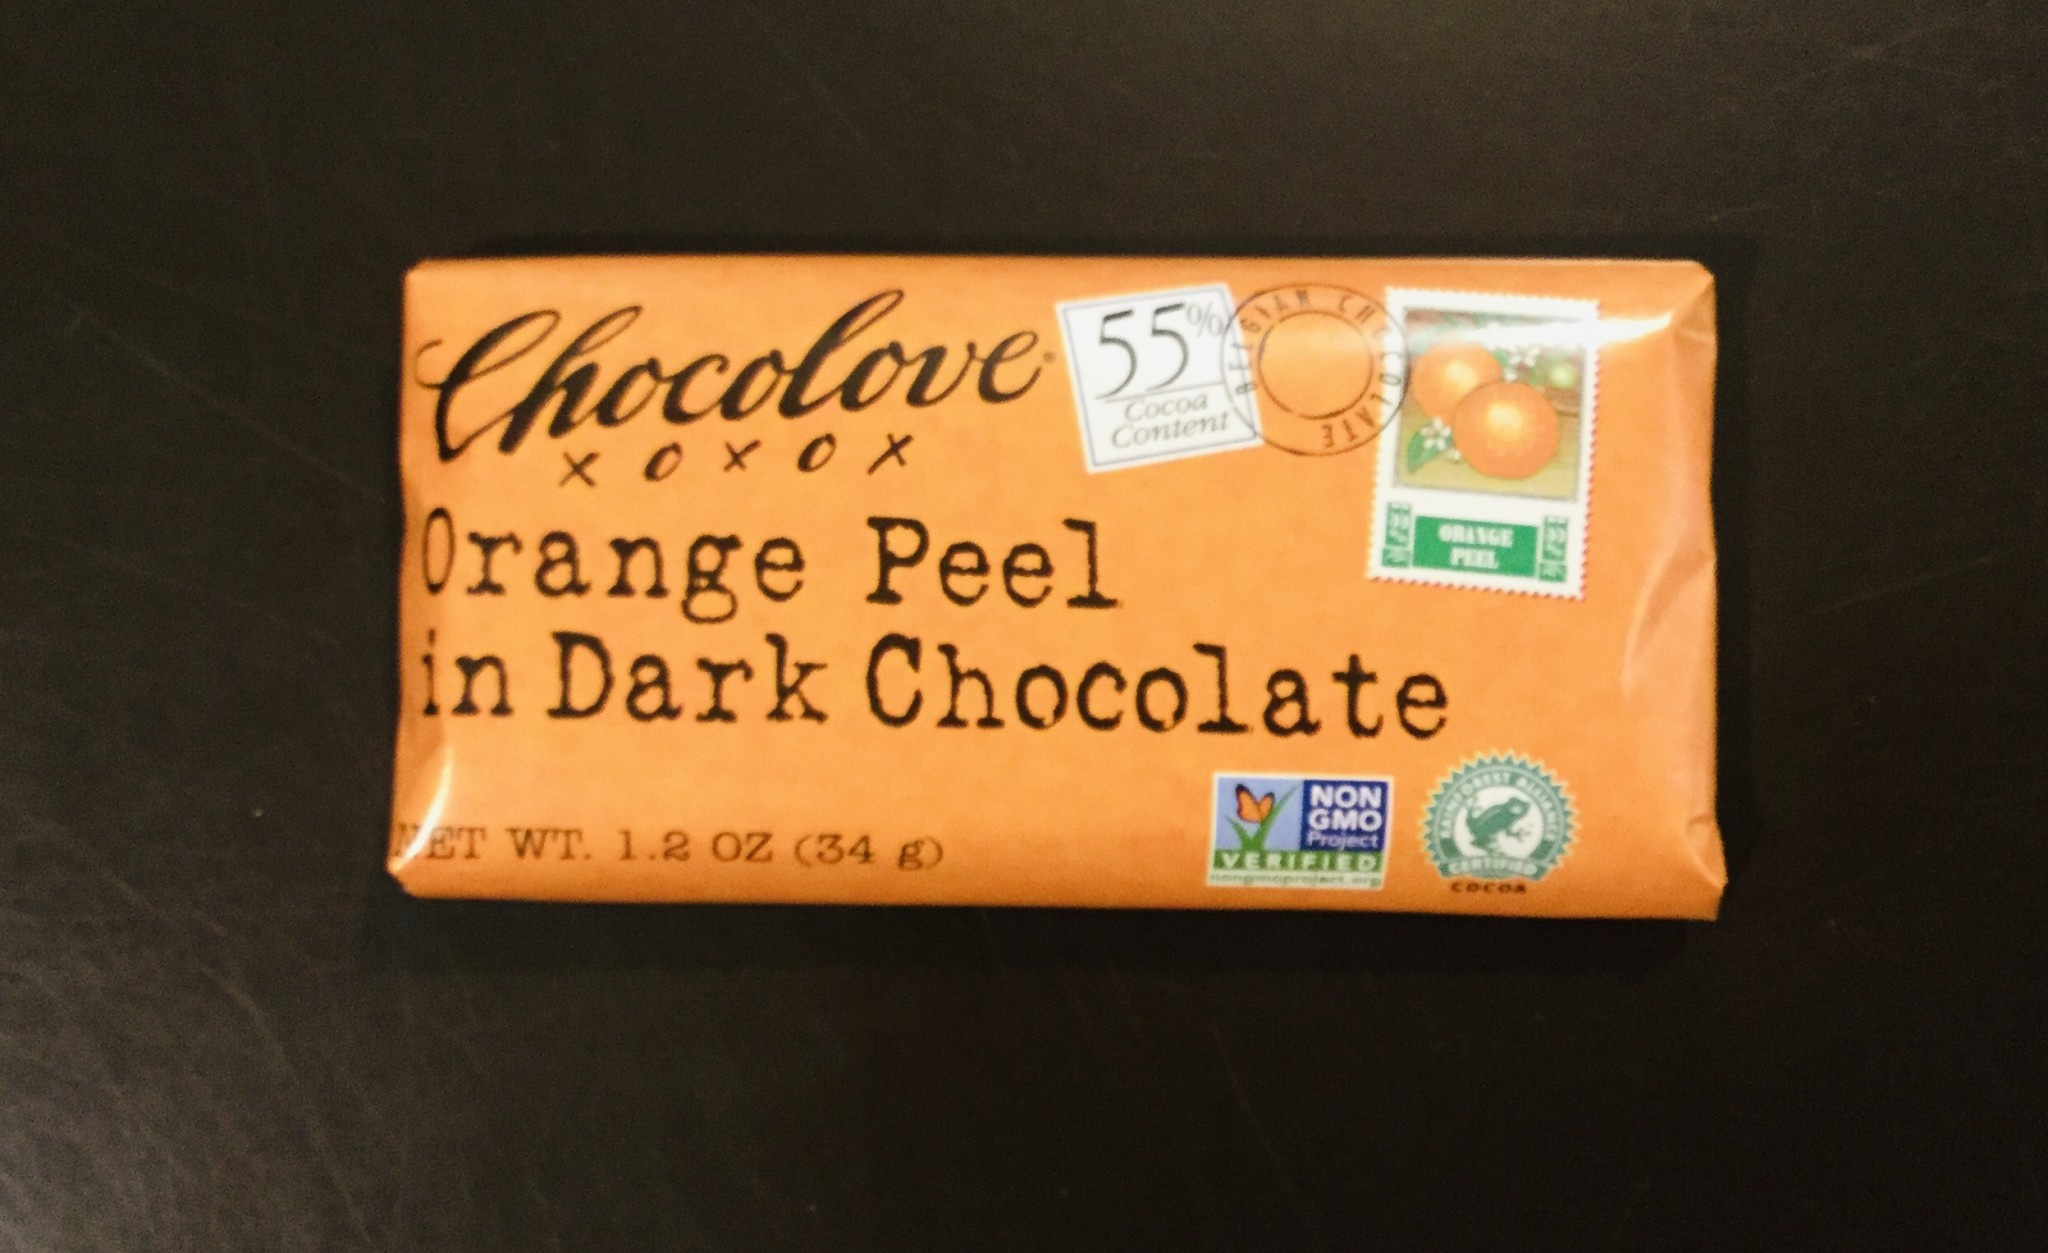 Chocolove Mini Orange Peel in Dark Chocolate 1.2 oz